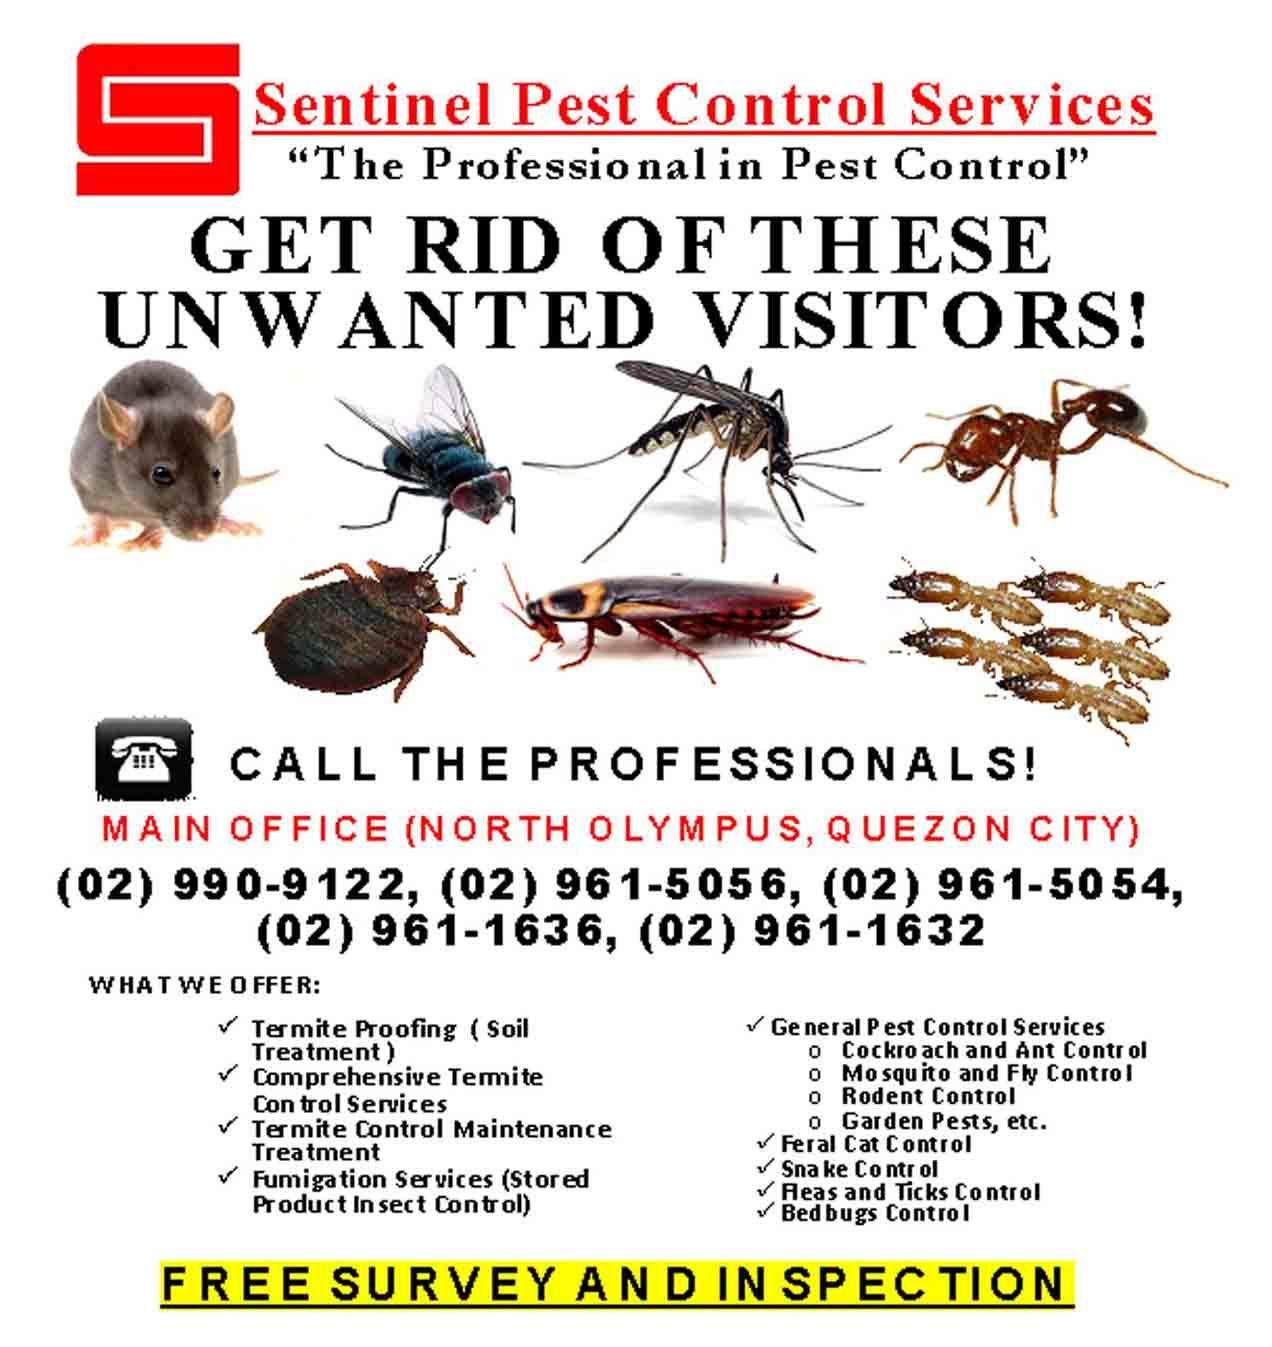 Services Pest Control Cockroach Sentinel Termite Service Professional Fumigation Pests Pest Control Pest Control Services Pest Prevention